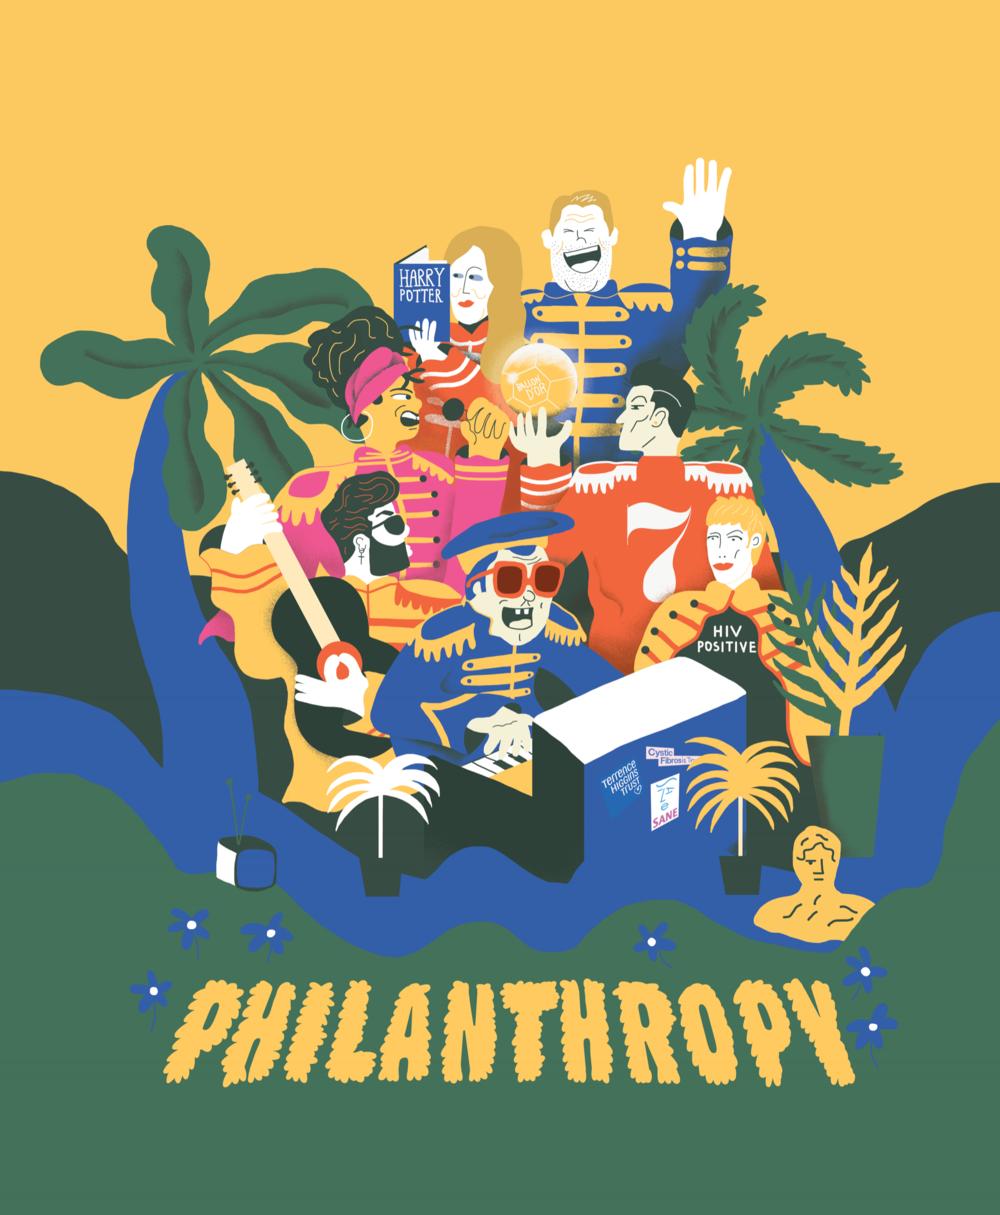 Celebrity Philanthropy in the U.K